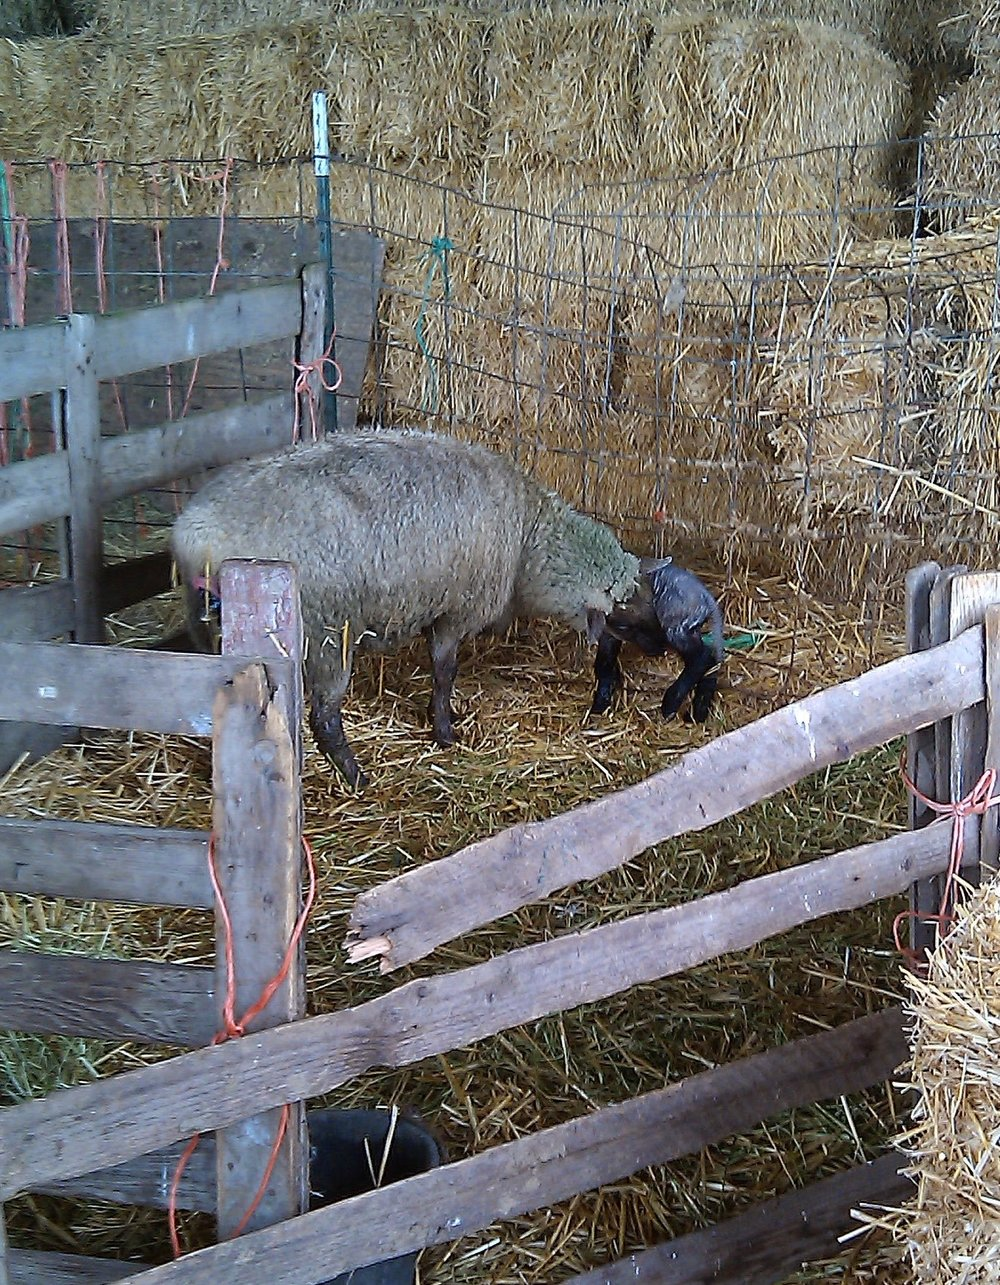 Lambing Time! Ewe with newborn lamb.